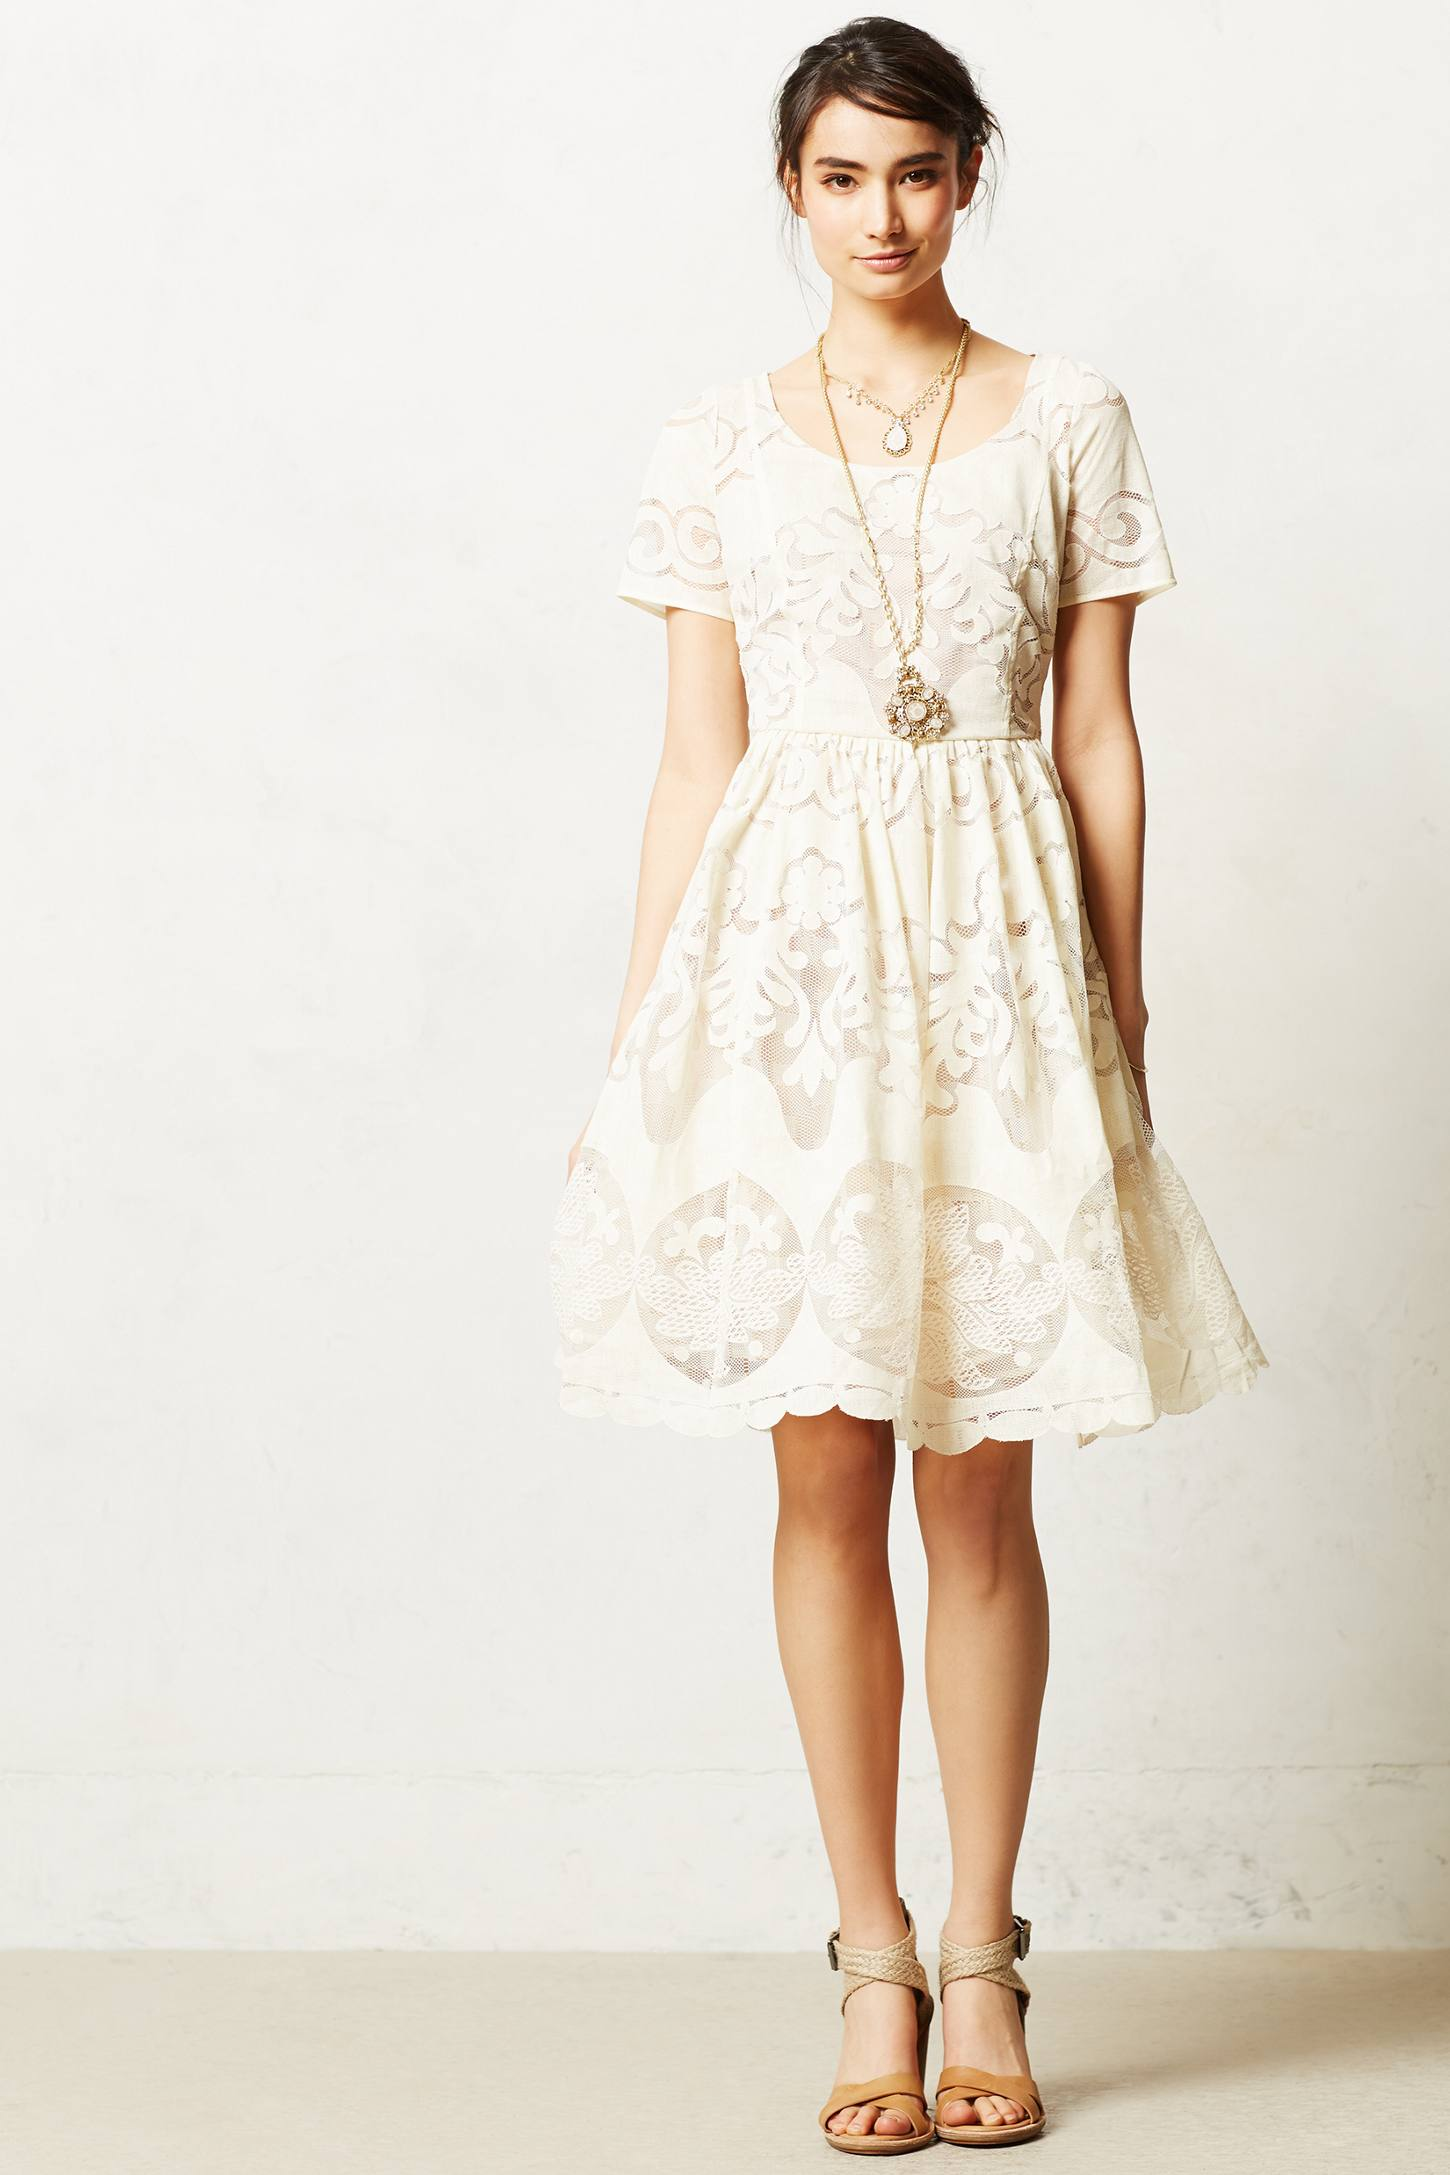 8894656e90fb Anthropologie Ivoire Dress by Tracy Reese Sz 2 - NWOT | eBay